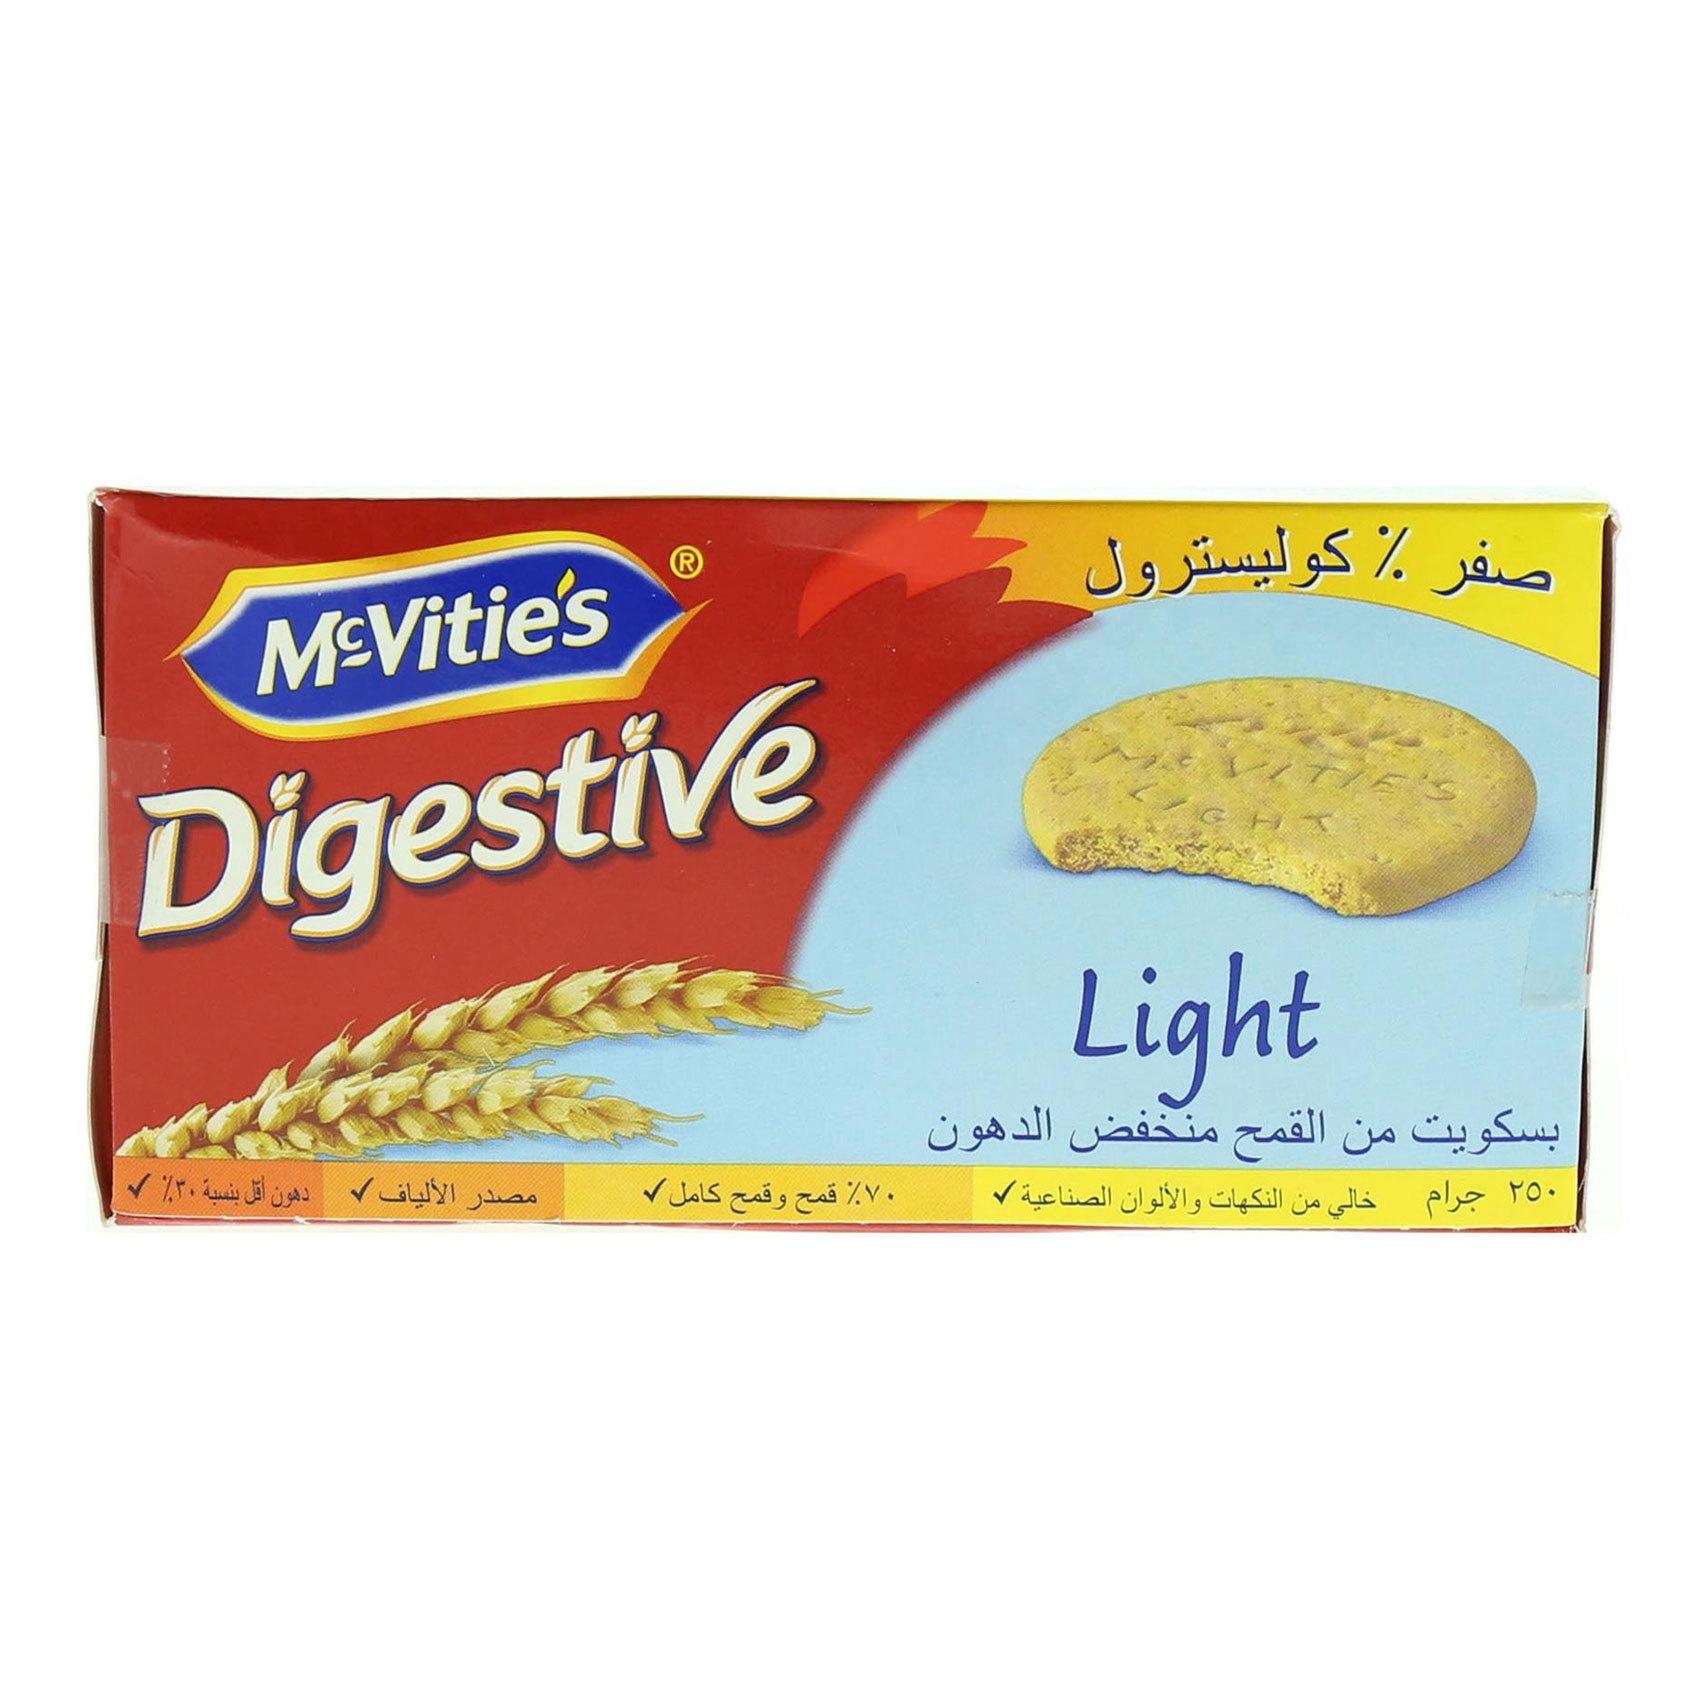 MCVITIE'S LIGHT DIGESTIVE 250G